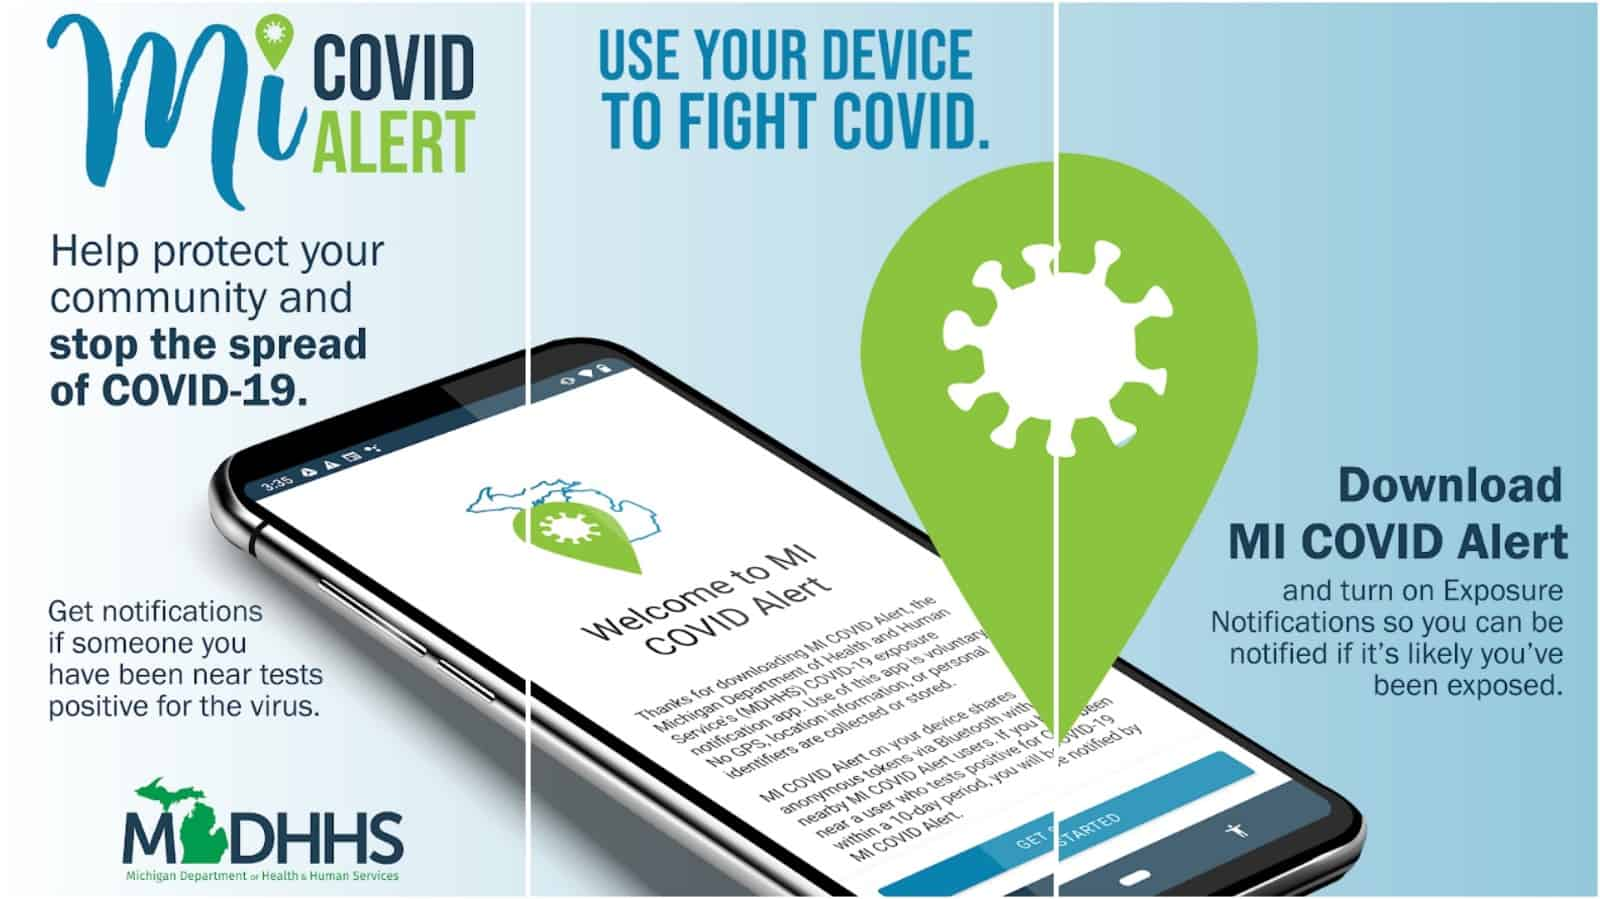 MI COVID Alert app grid image